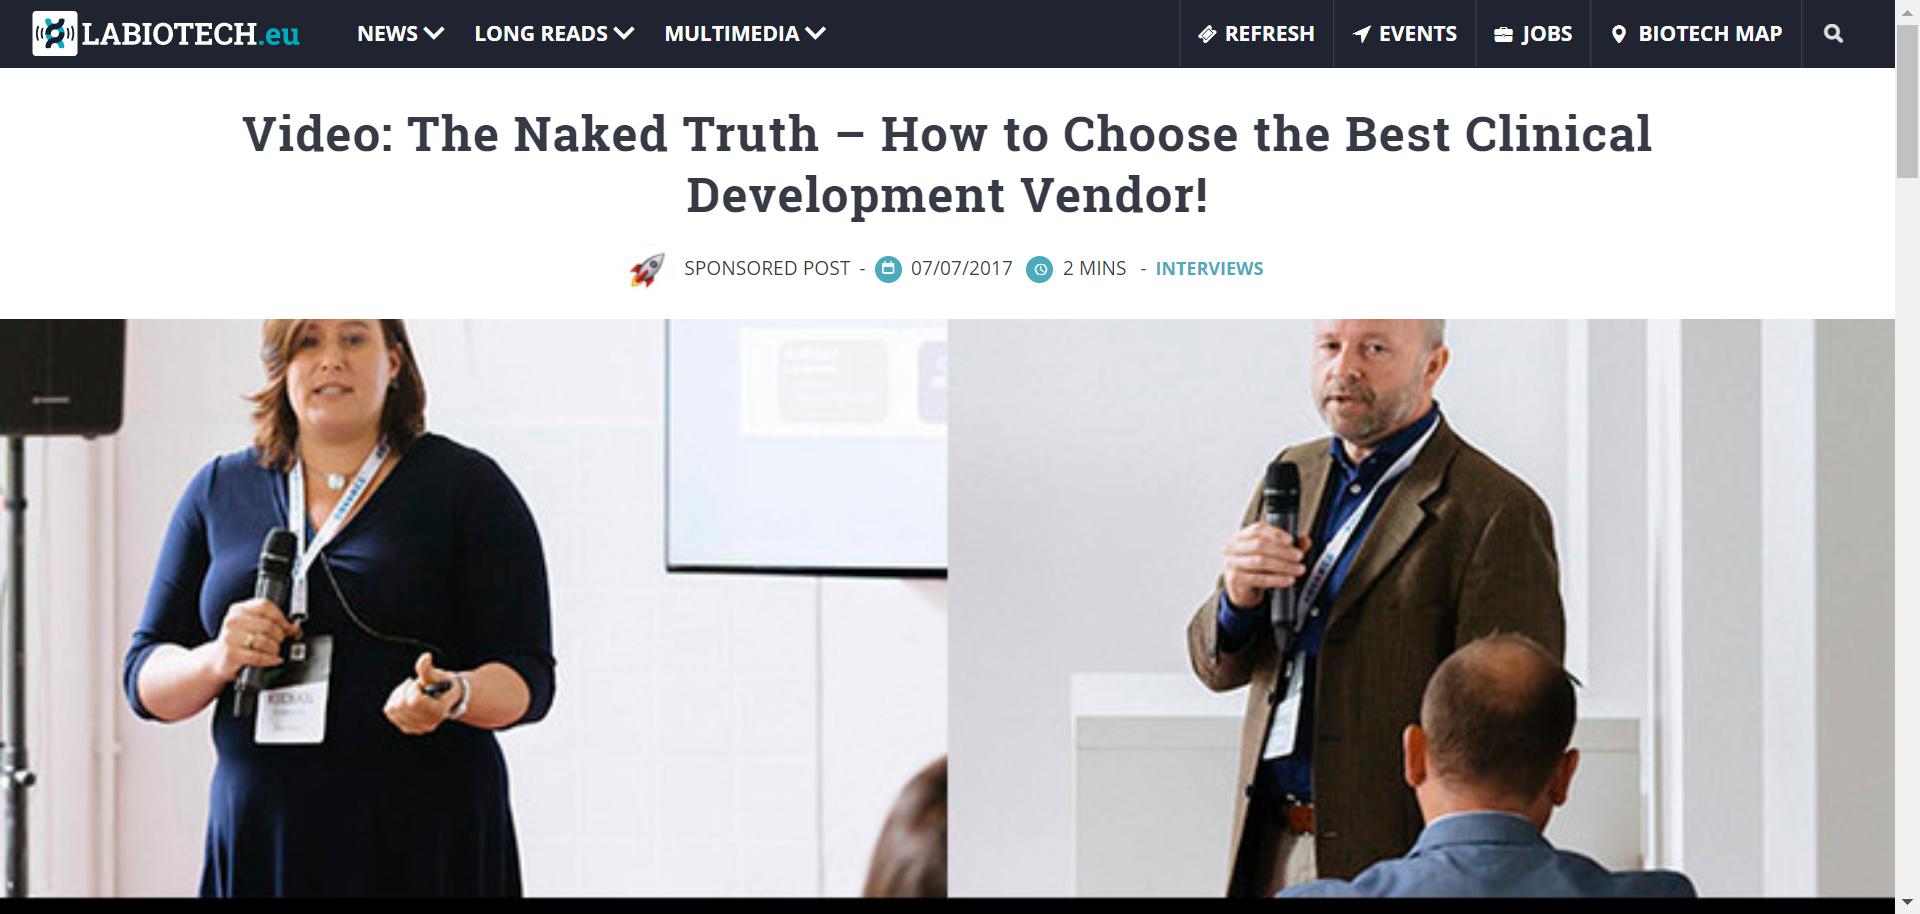 Kieran speaks about vendor selection